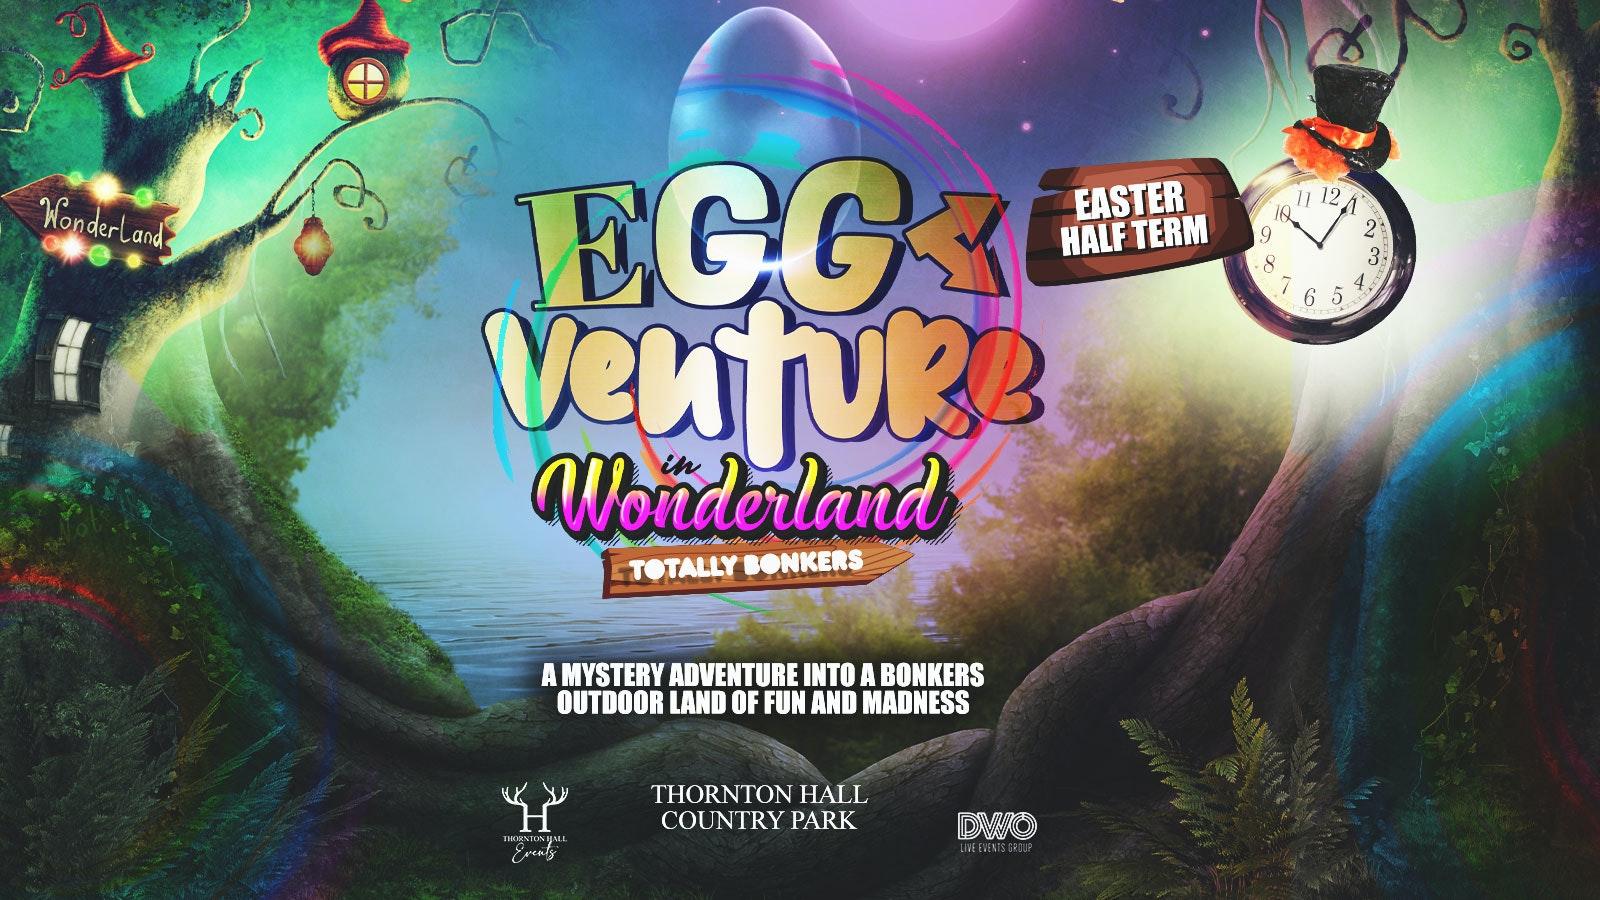 EggVenture in Wonderland – Thursday 8th April – 11am